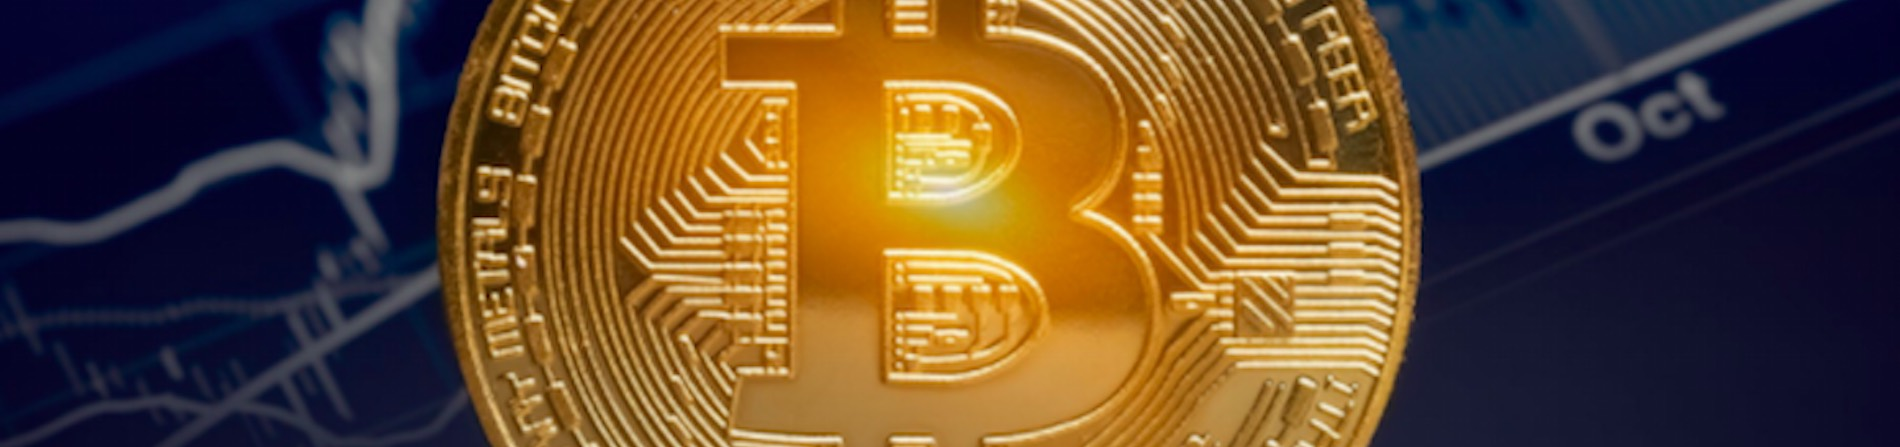 Gambling on Bitcoin